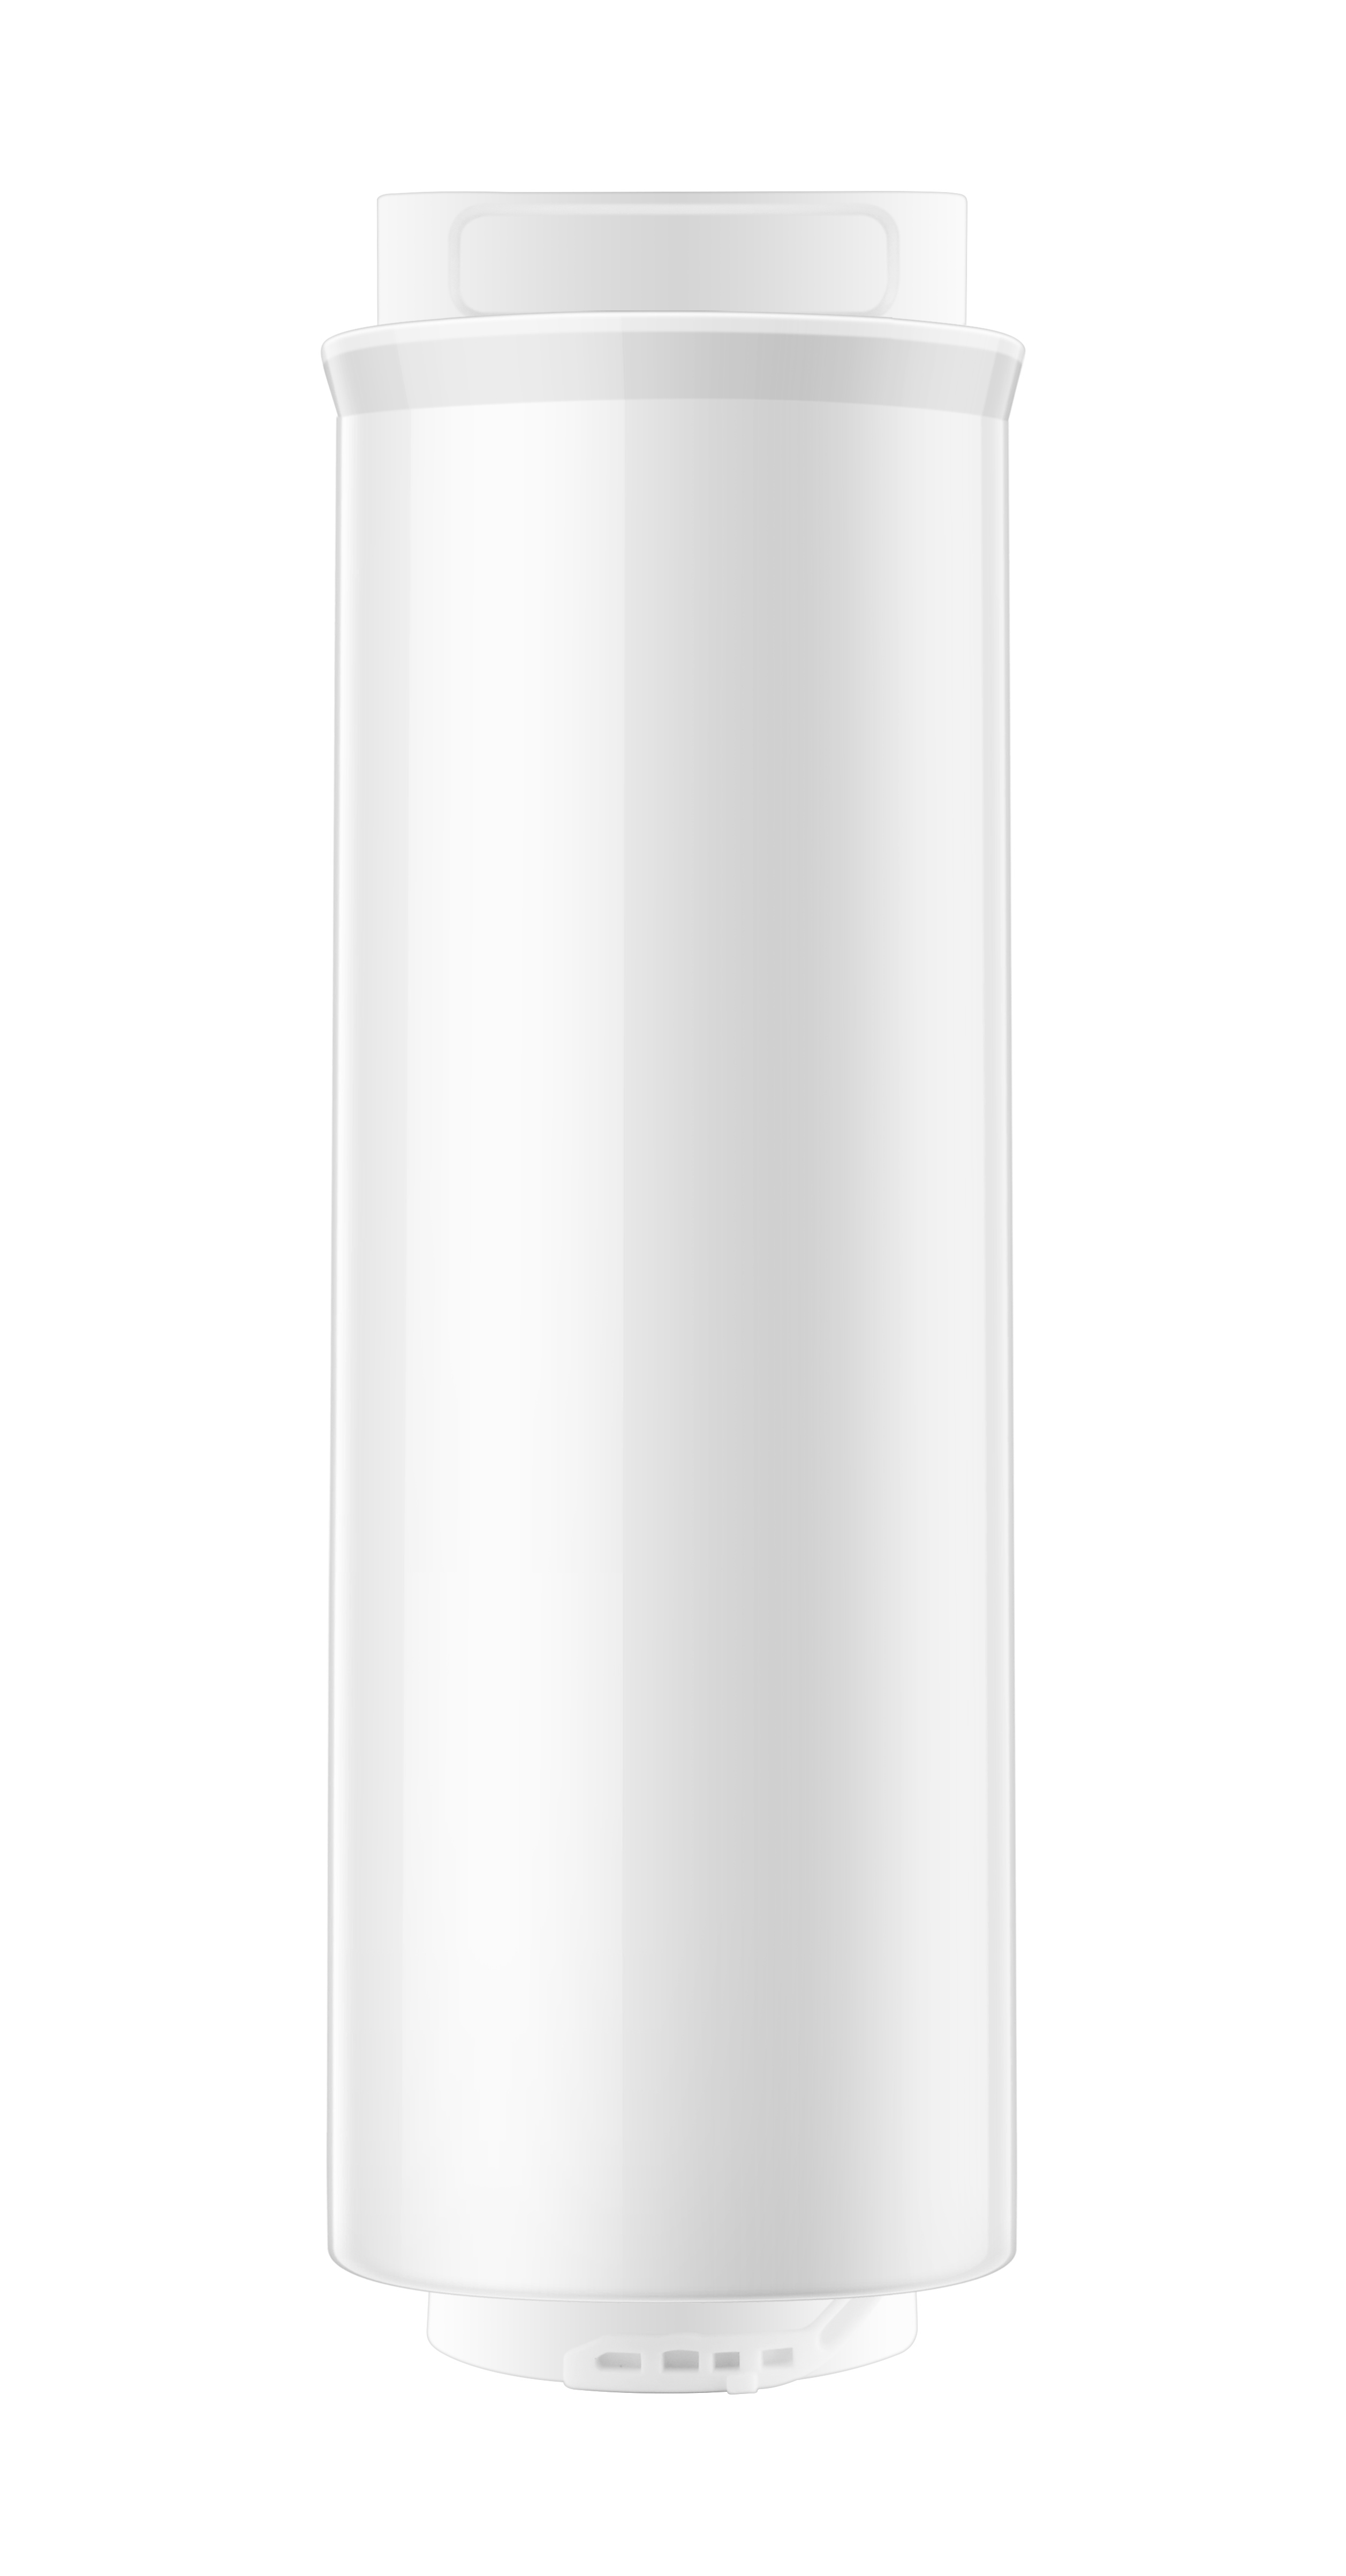 Ersatzfilter HPCC für PUR Premium Top 600 GPD